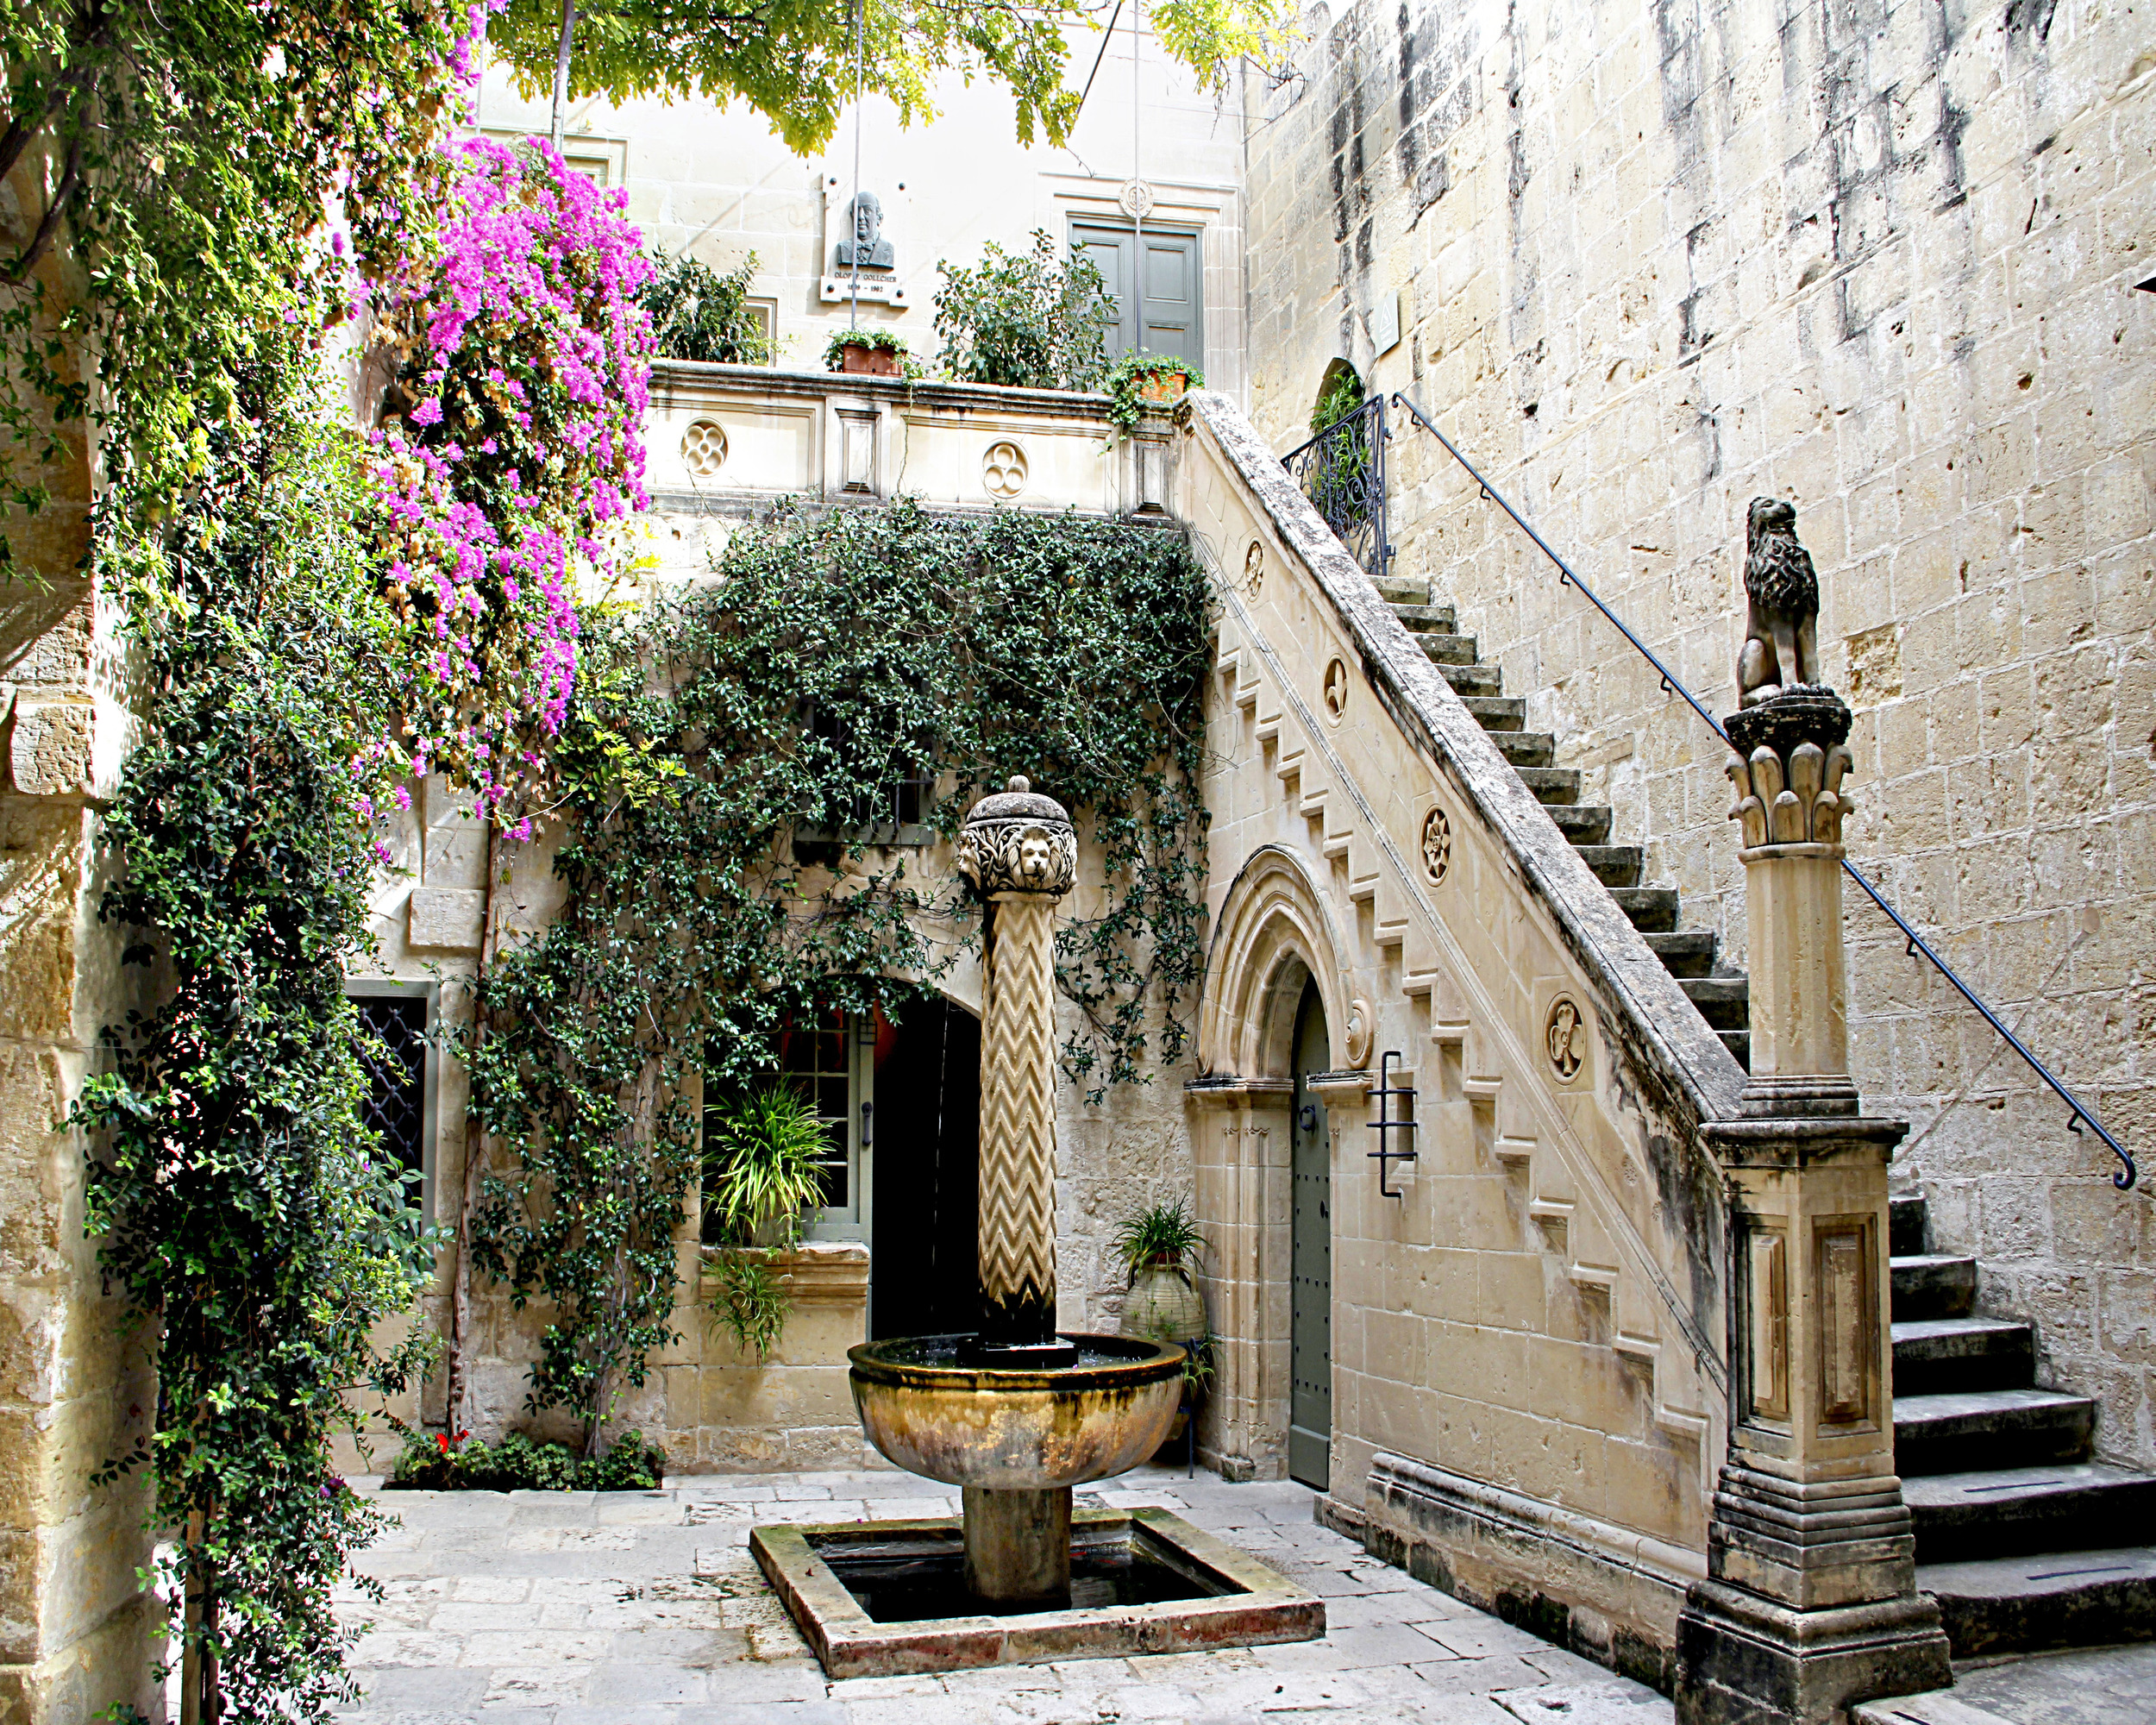 Fountain in a Courtyard  E106